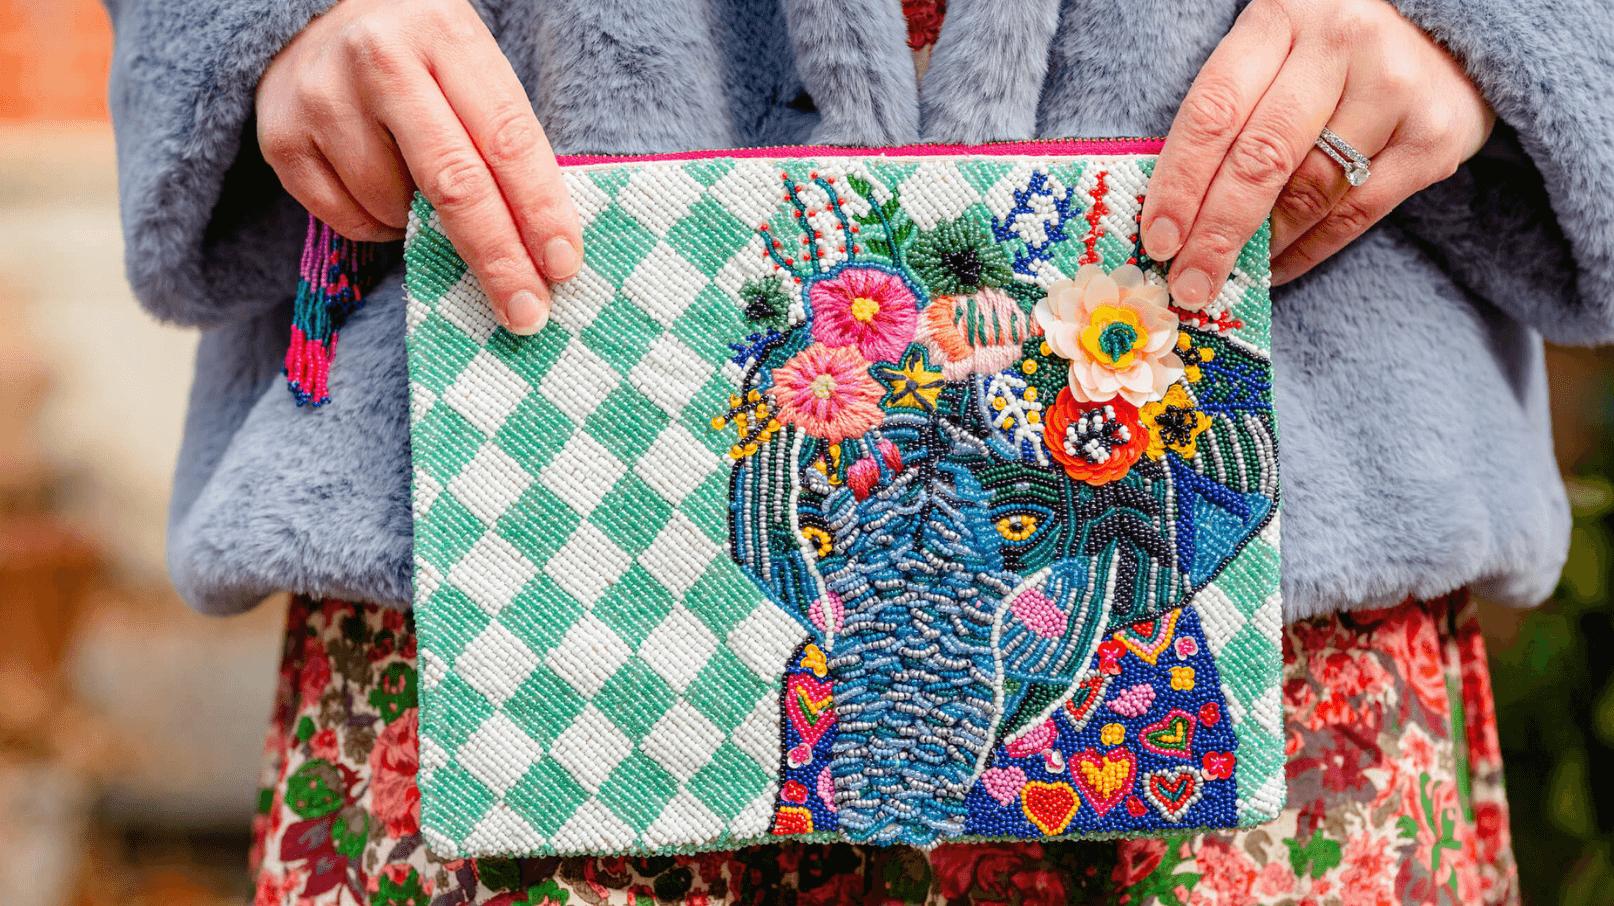 Sezane Floral Maxi Aquatalia Booties Elephant Clutch Free People Faux Fur Coat Look by Modnitsa Styling